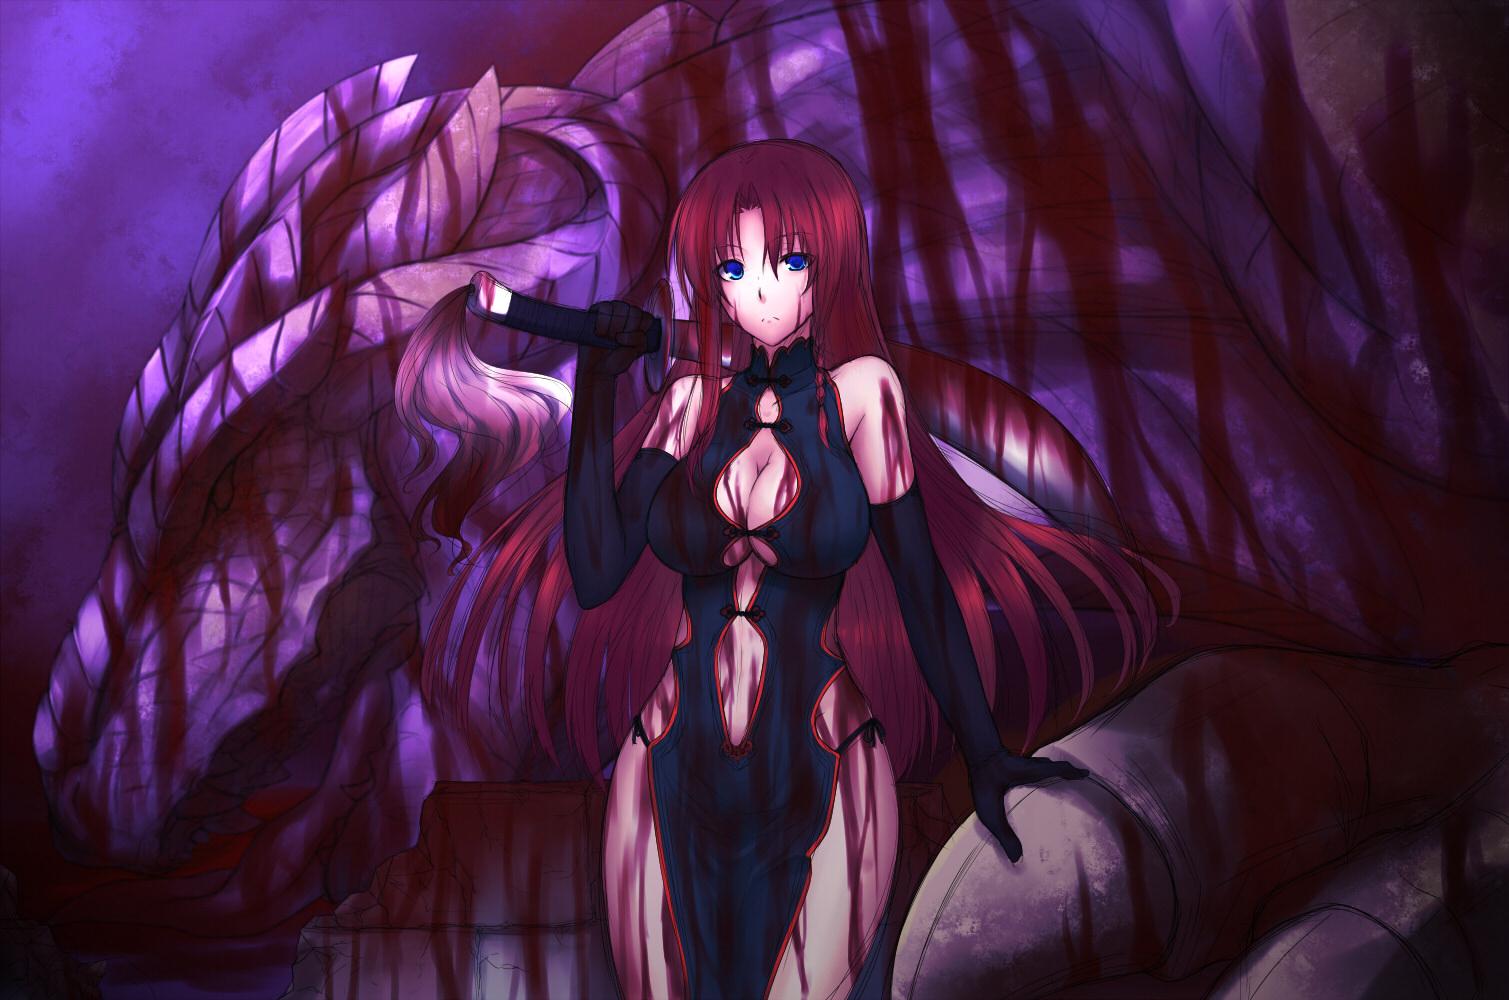 Red hair purple dress cartoon images